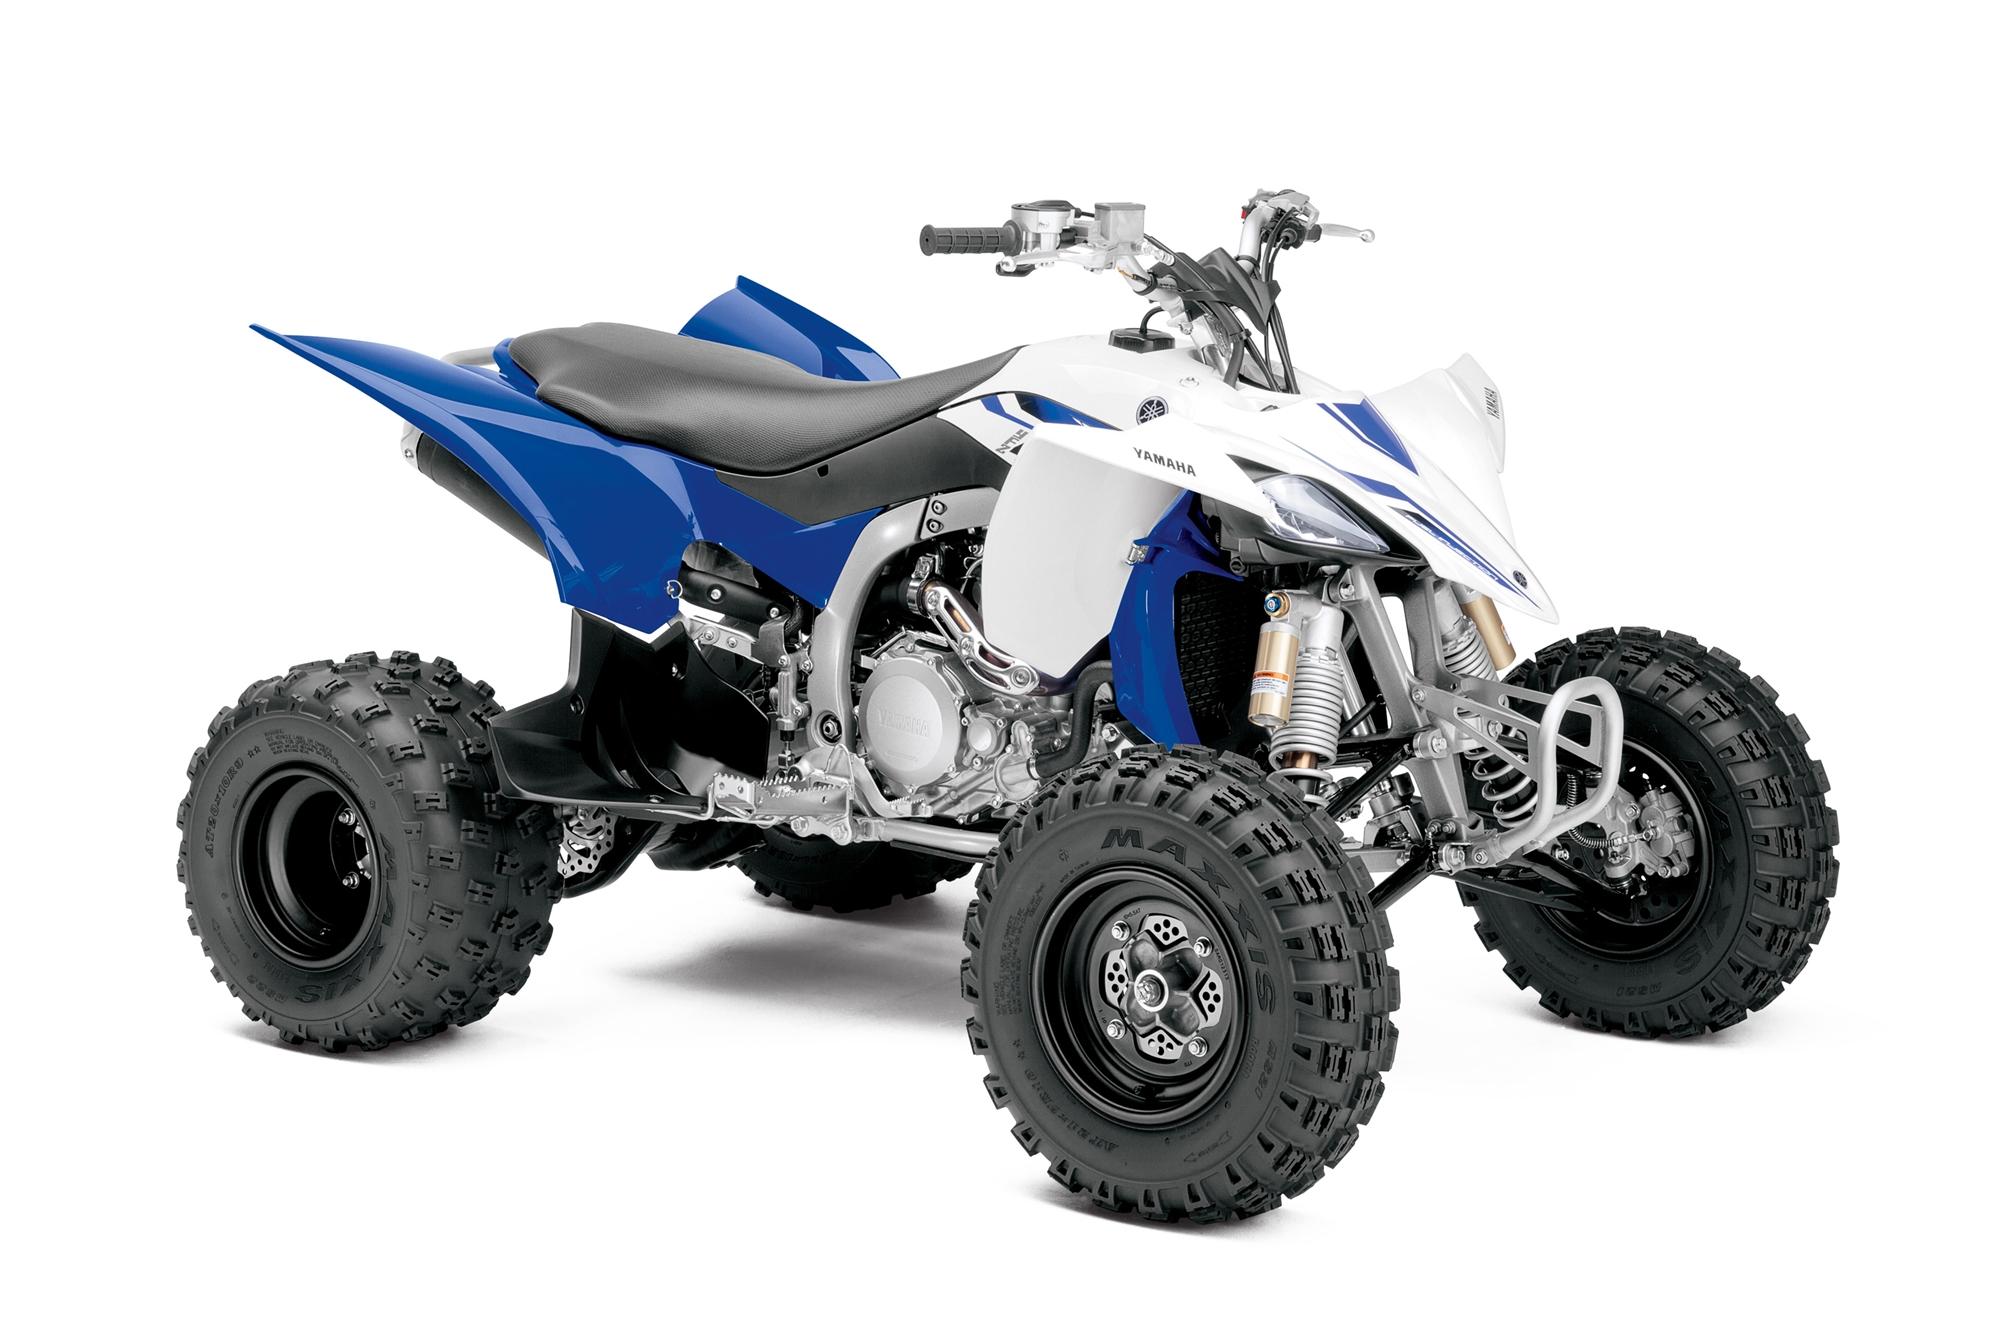 2014 Yamaha YFZ450R Brings Slipper Clutch to the ATV World - autoevolution